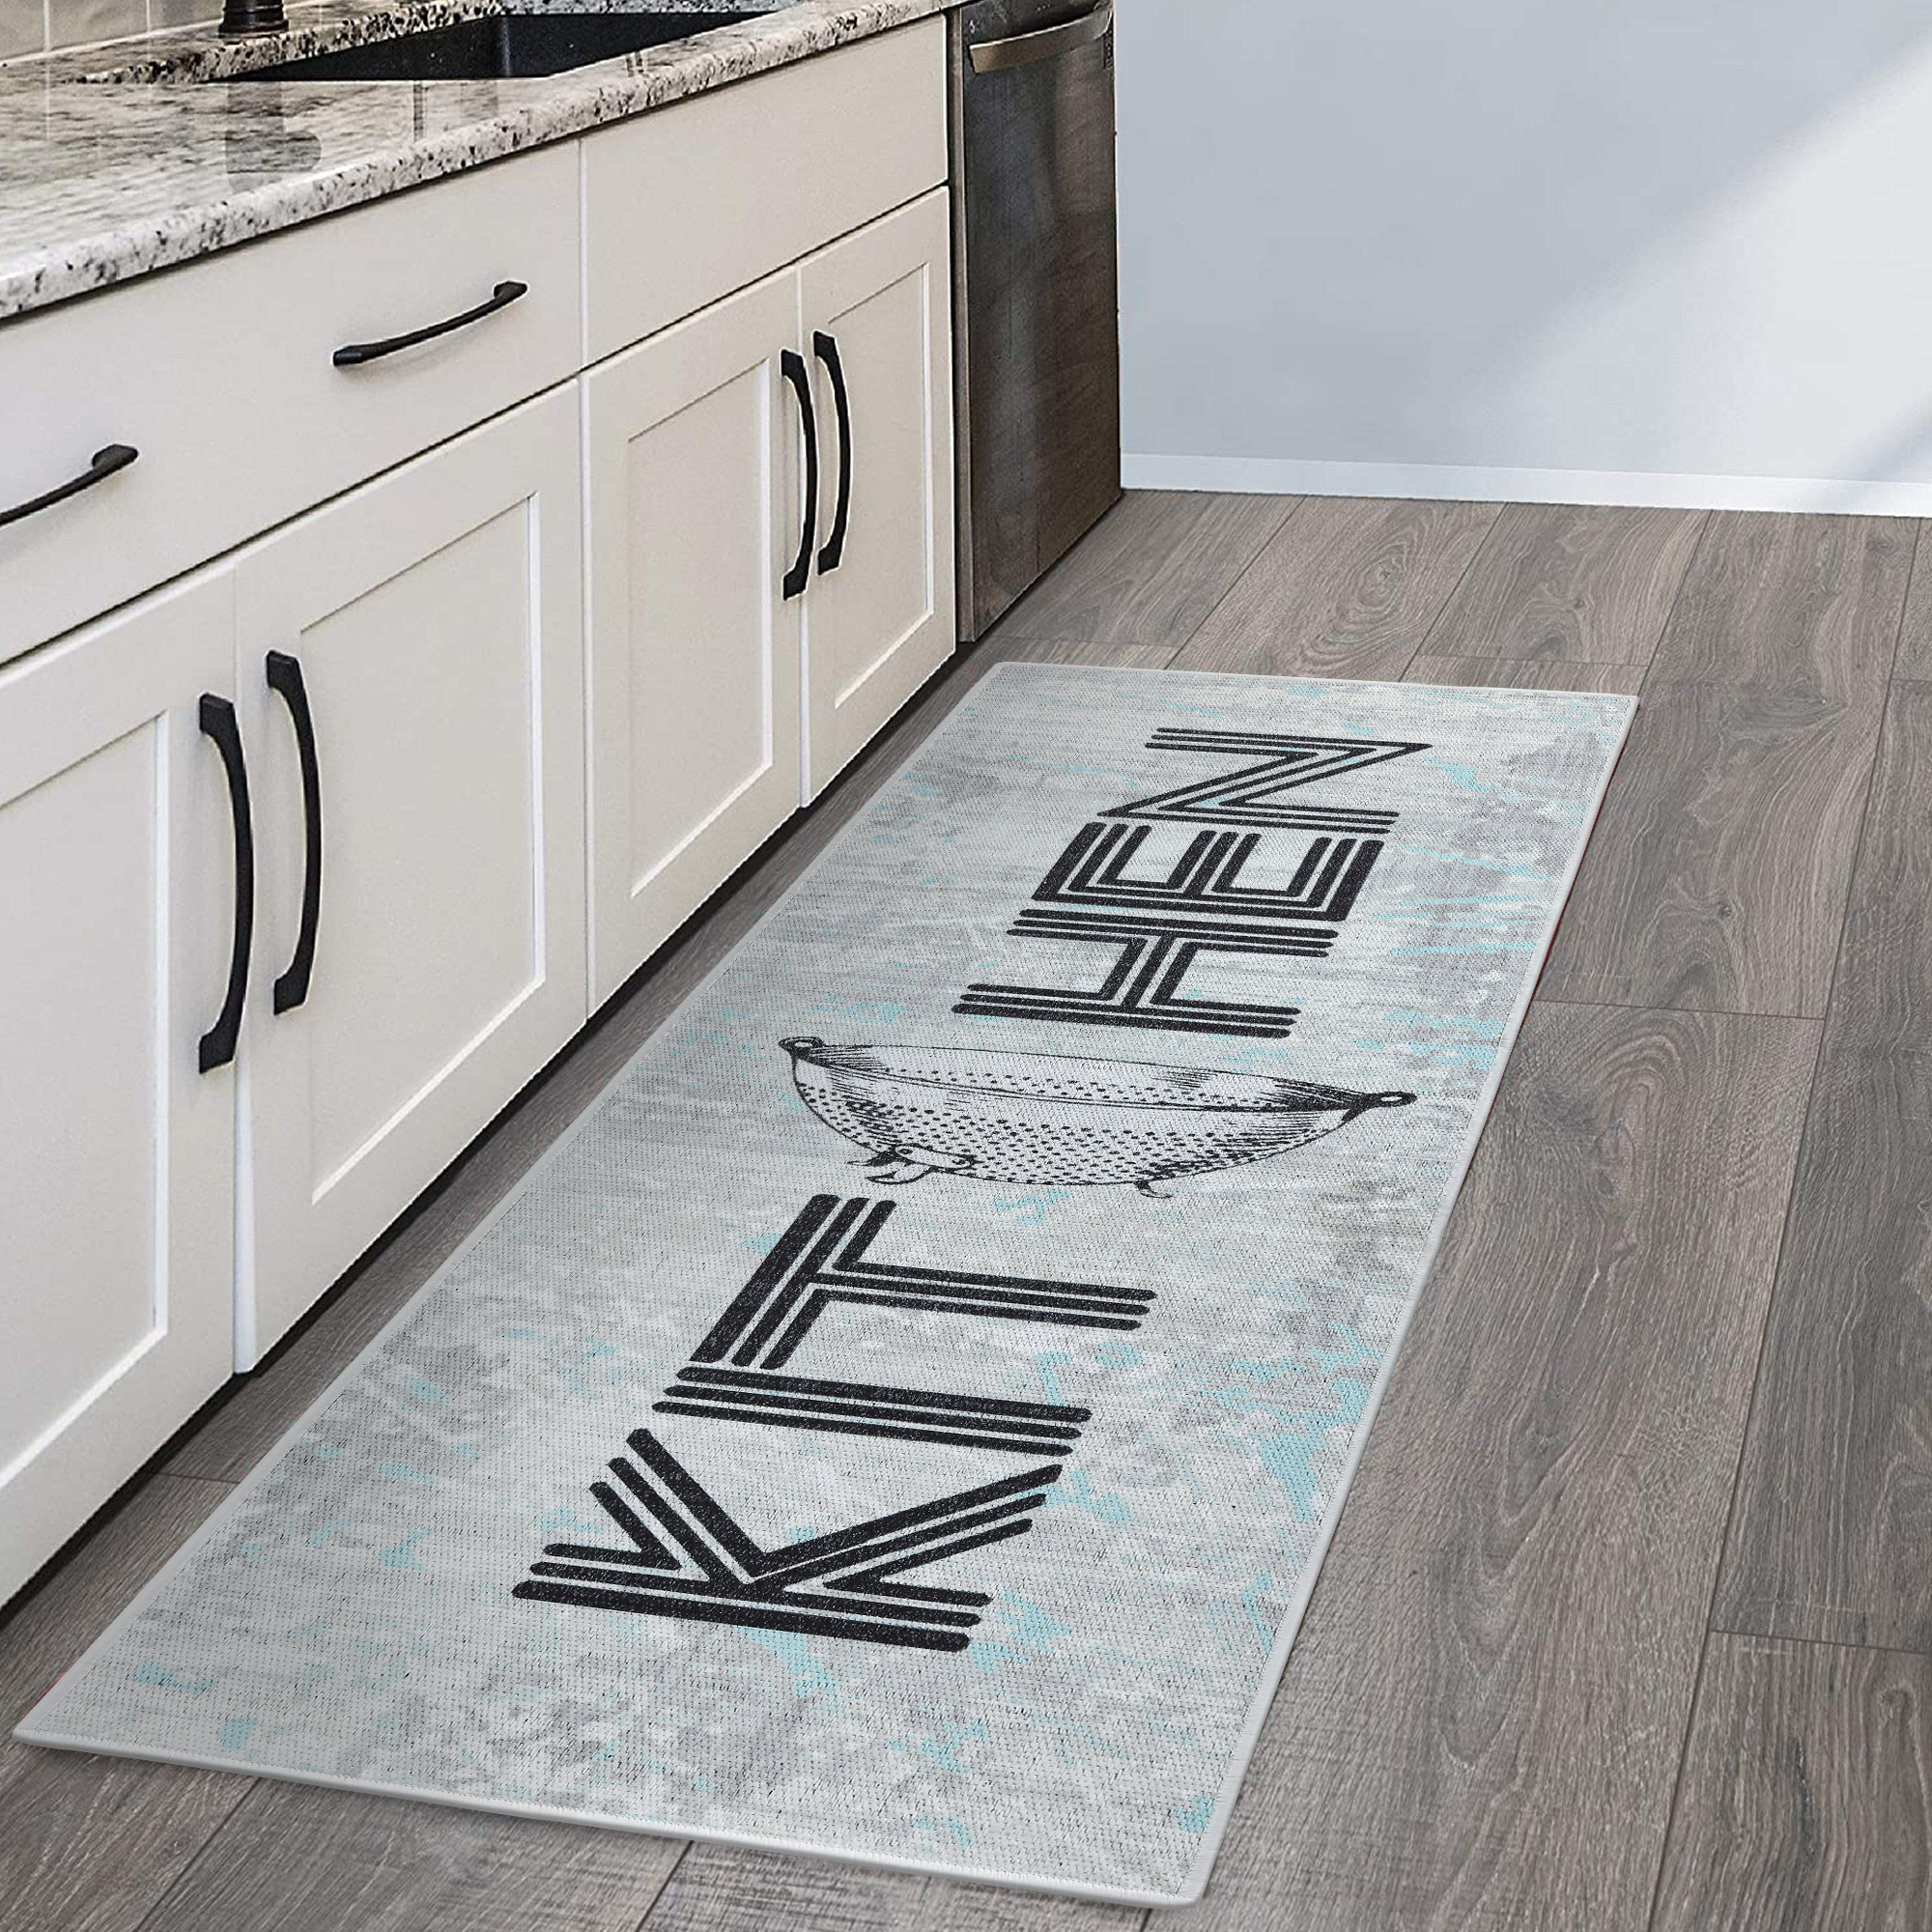 Sussexhome Non Skid Washable Kitchen Runner Rug Ultra Thin 70 Cotton Kitchen Floor Mat For In Front Of Sink 20 X 59 Inches Heavy Duty Runner Rug For Kitchen Floor Walmart Com Walmart Com